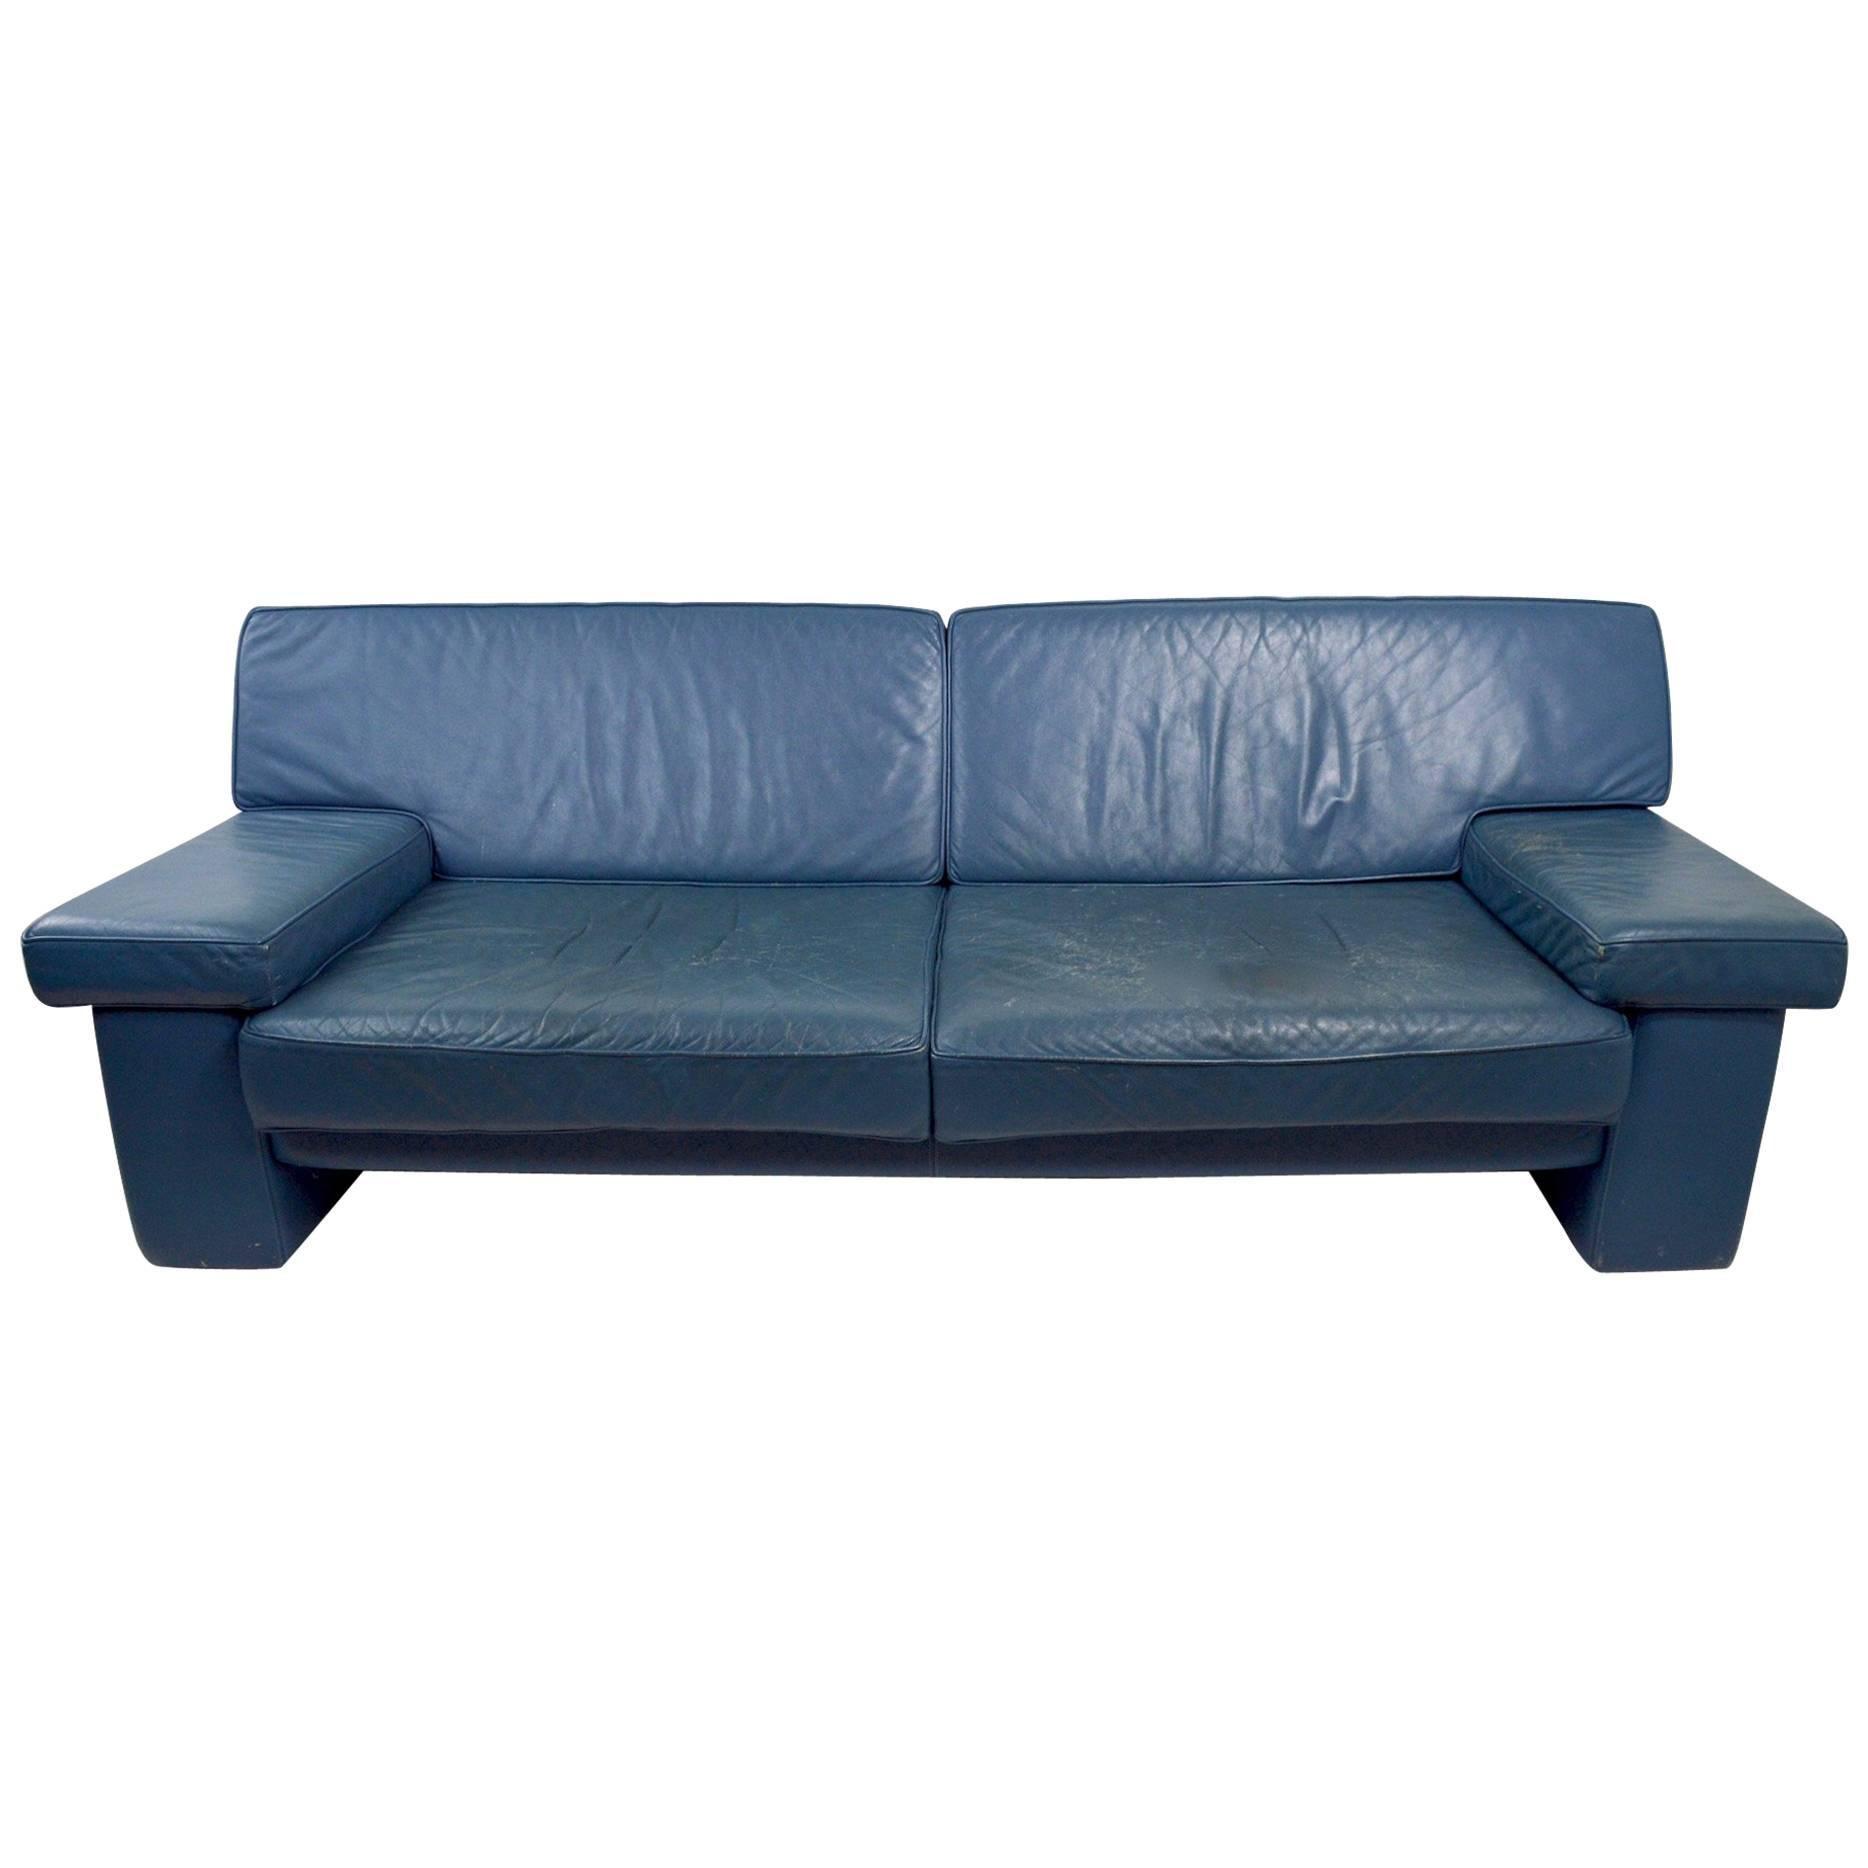 Walter Knoll Leather Sofa for Sirino Brayton International